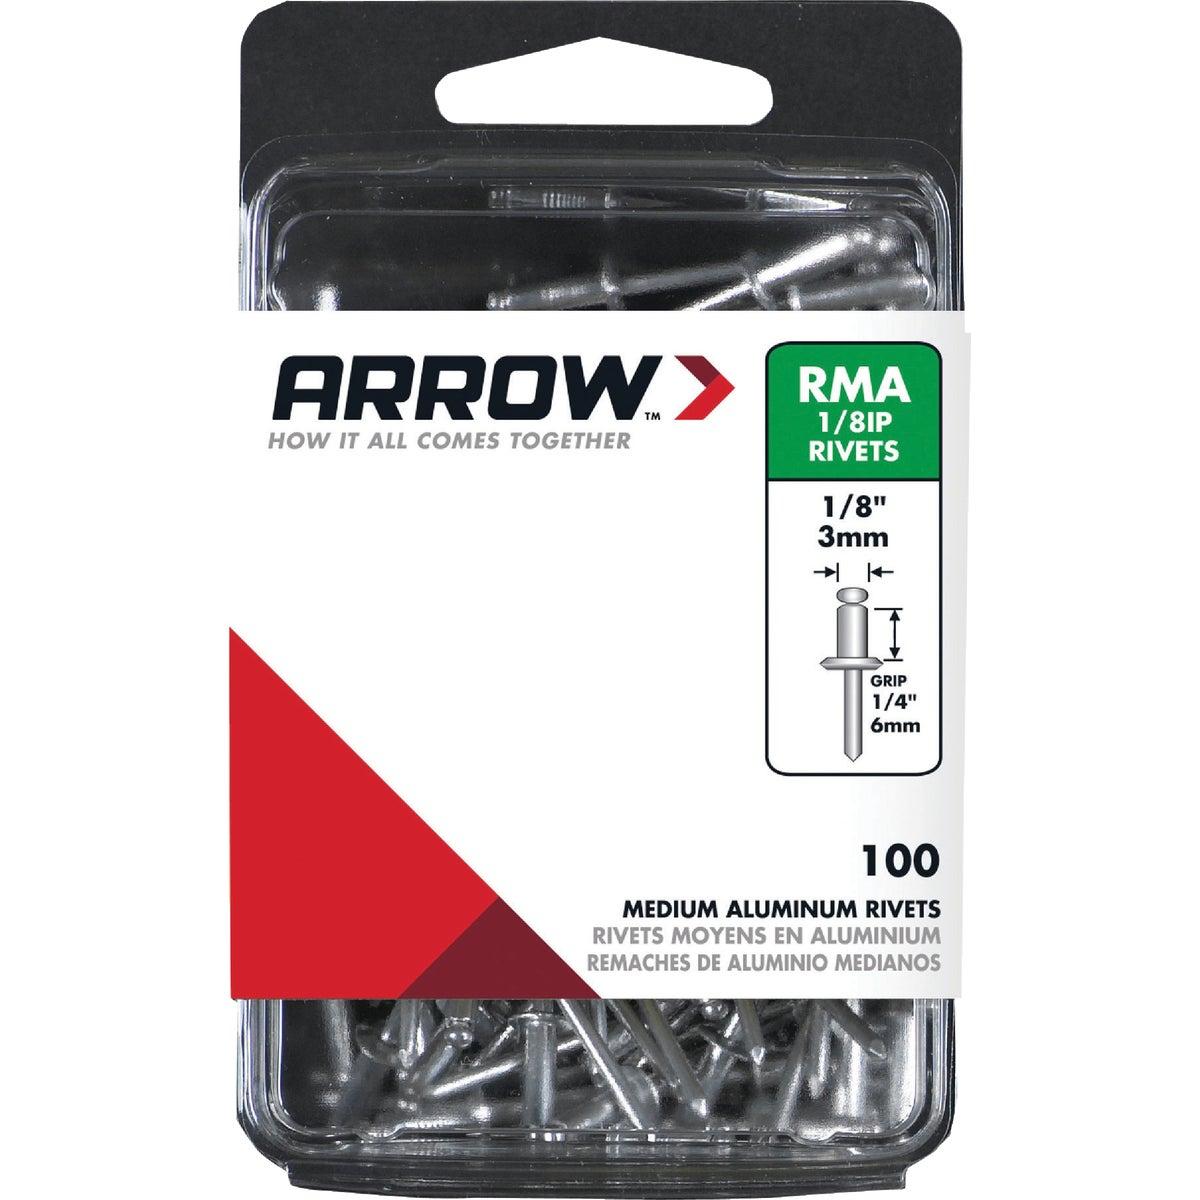 Arrow Fastener 1/8X1/4 ALUM RIVET RMA1/8IP